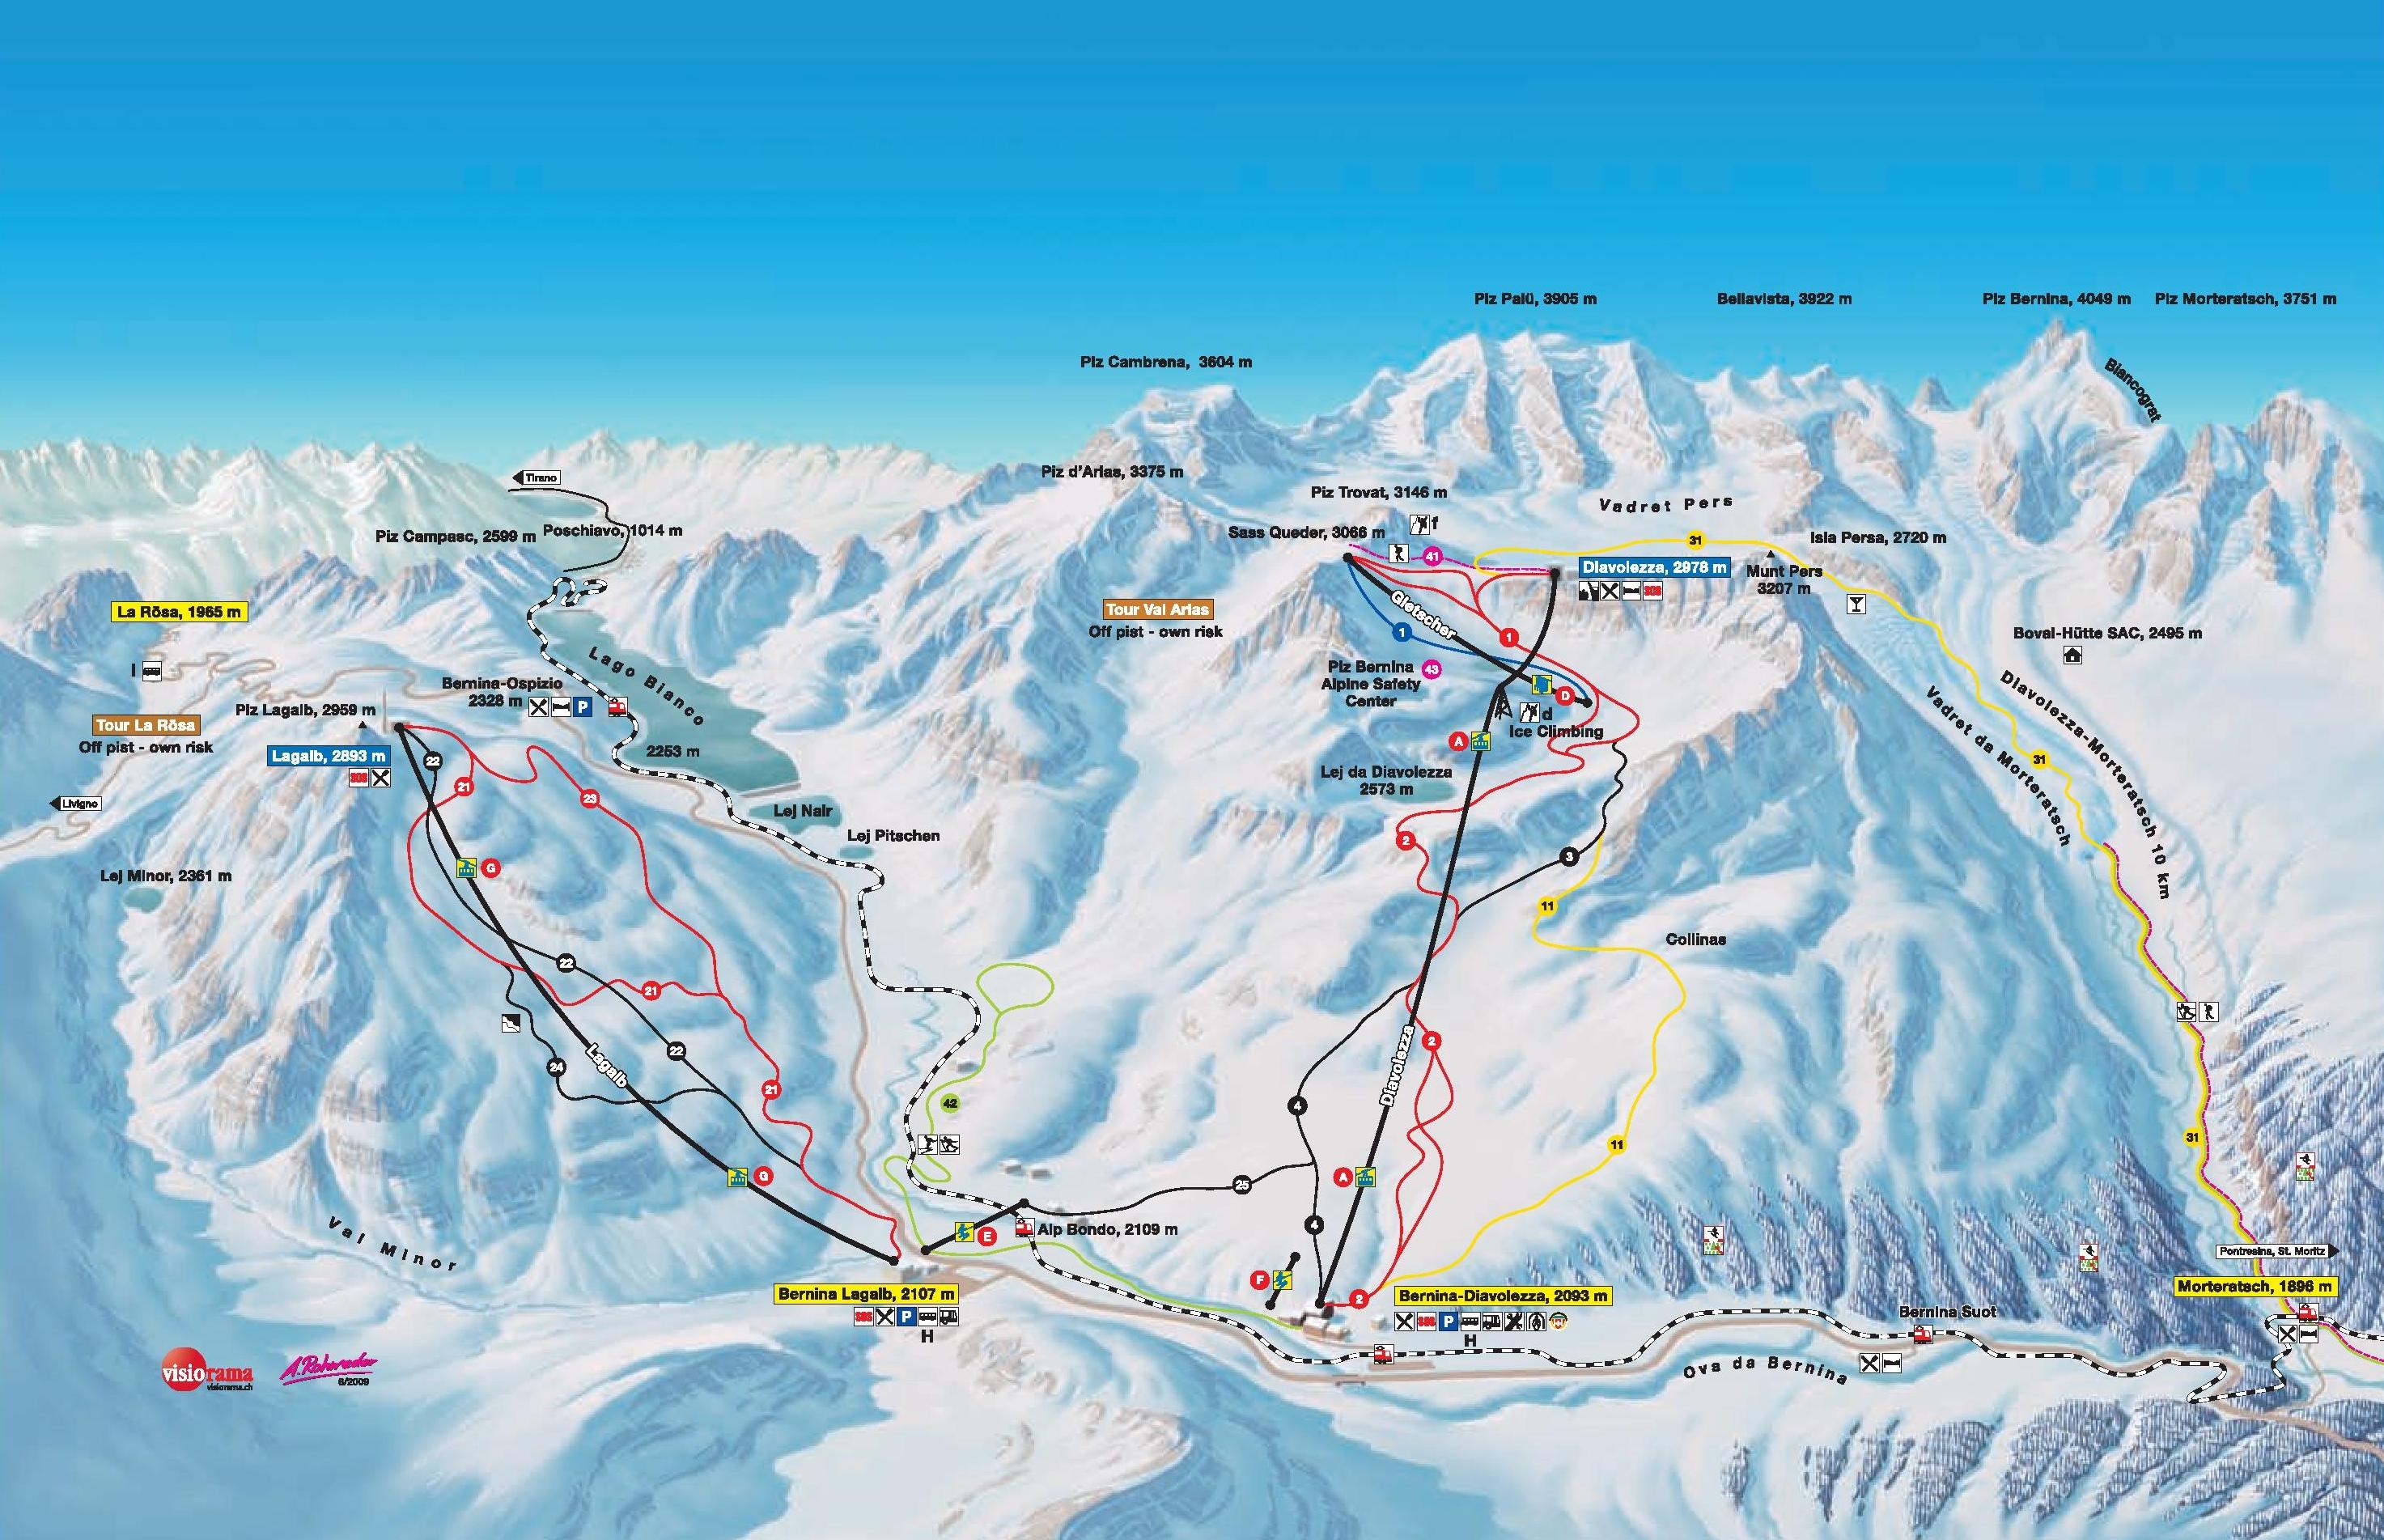 St Moritz Maps Switzerland Maps of St Moritz